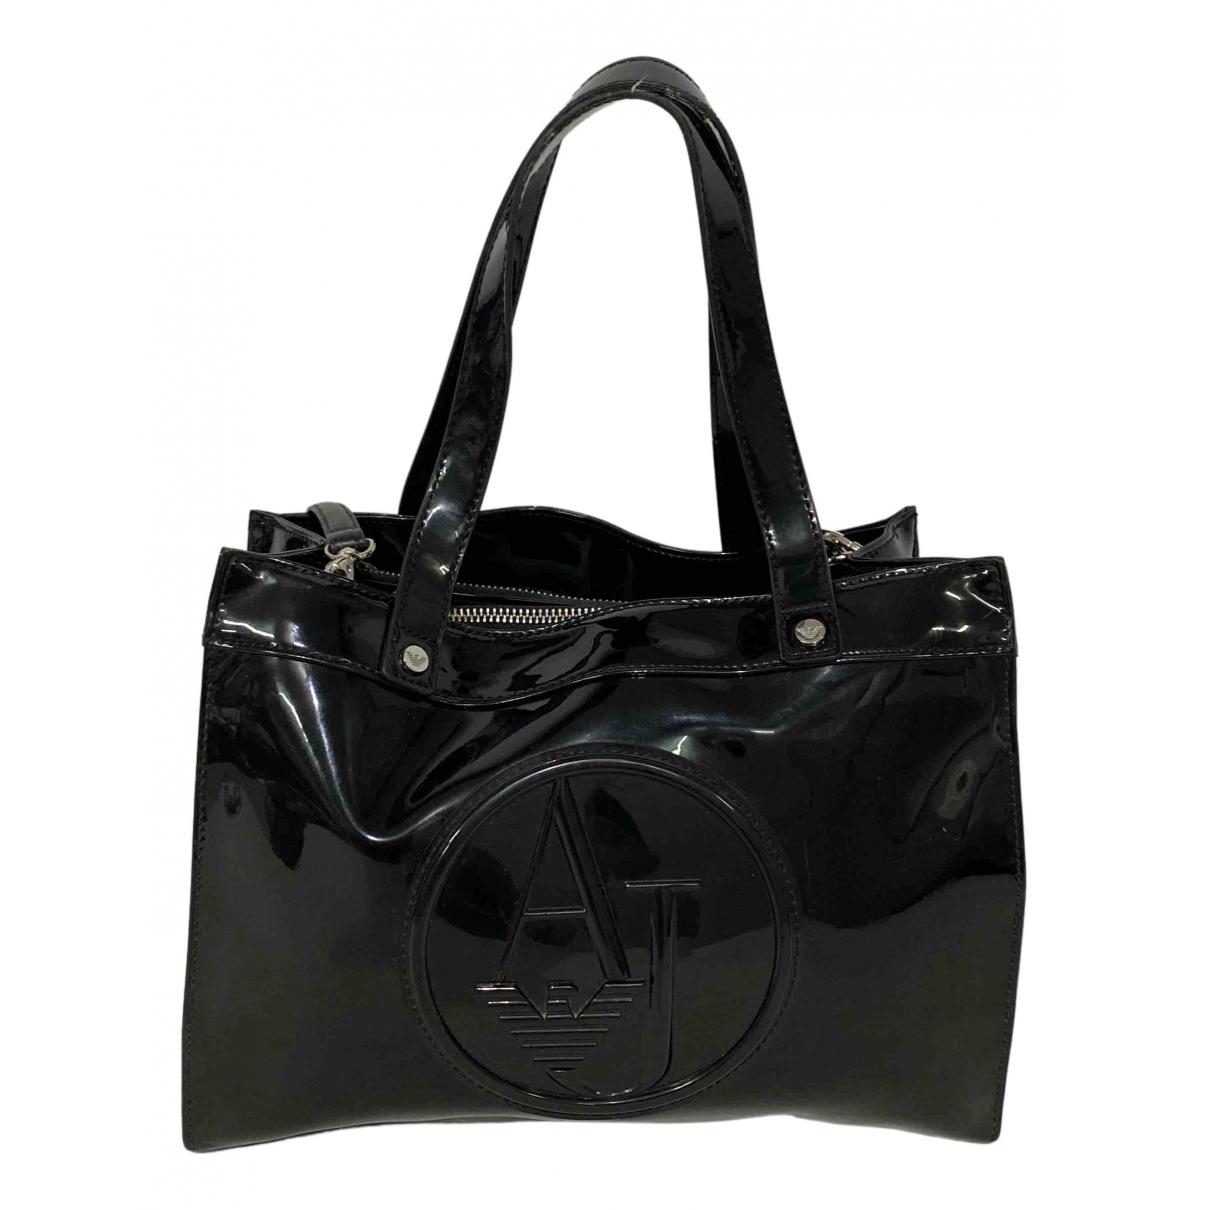 Armani Jeans N Black handbag for Women N